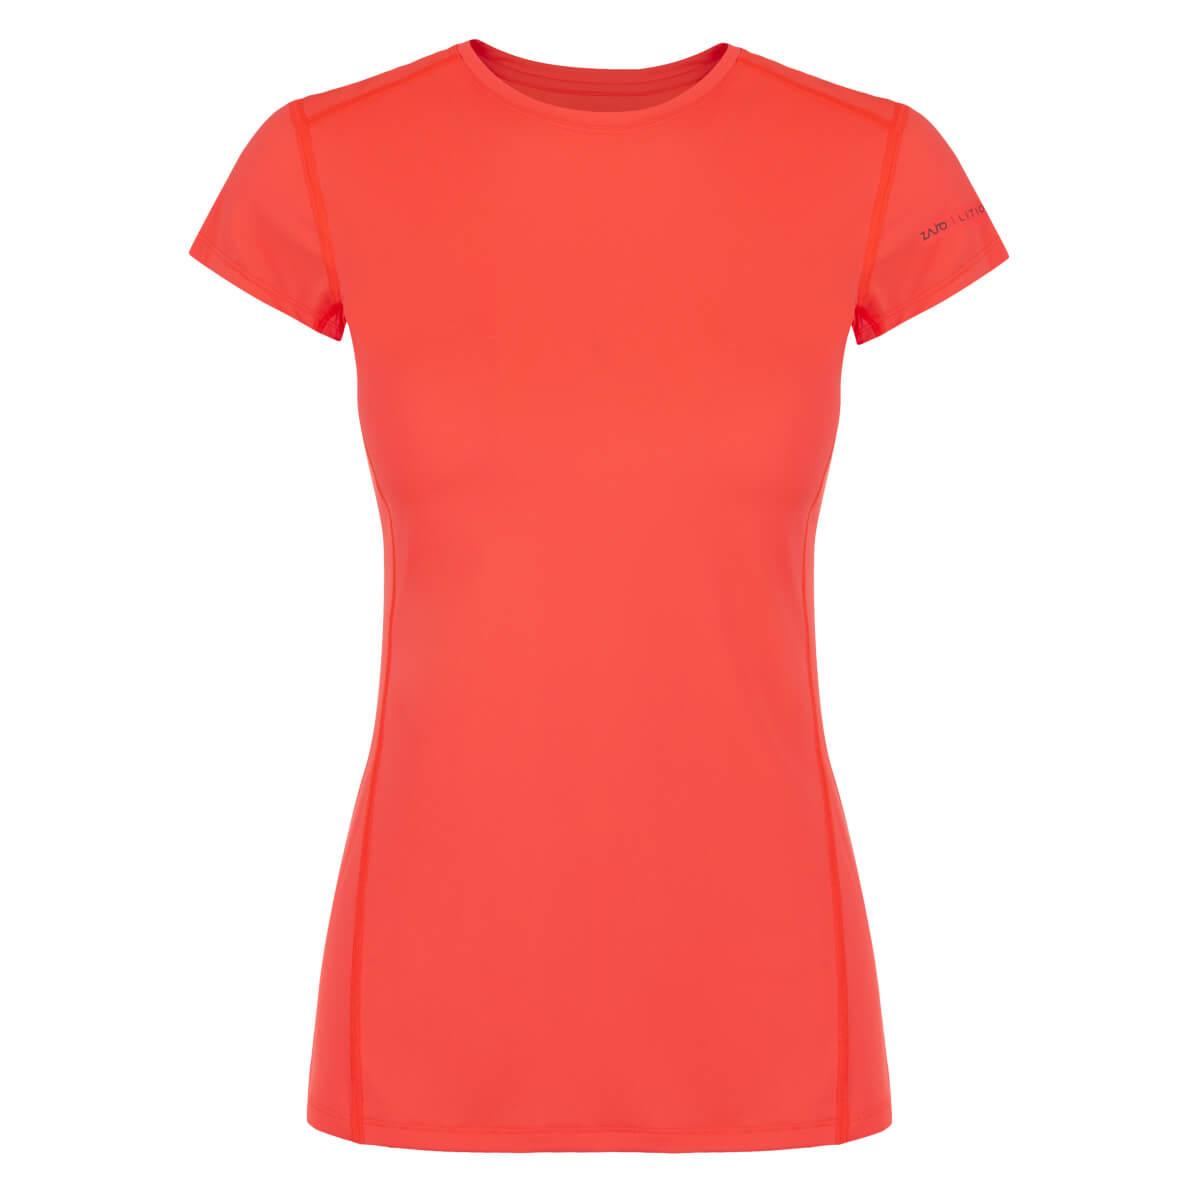 ZAJO Litio W T-shirt SS Fluo Coral dámske tričko - veľkosť XS